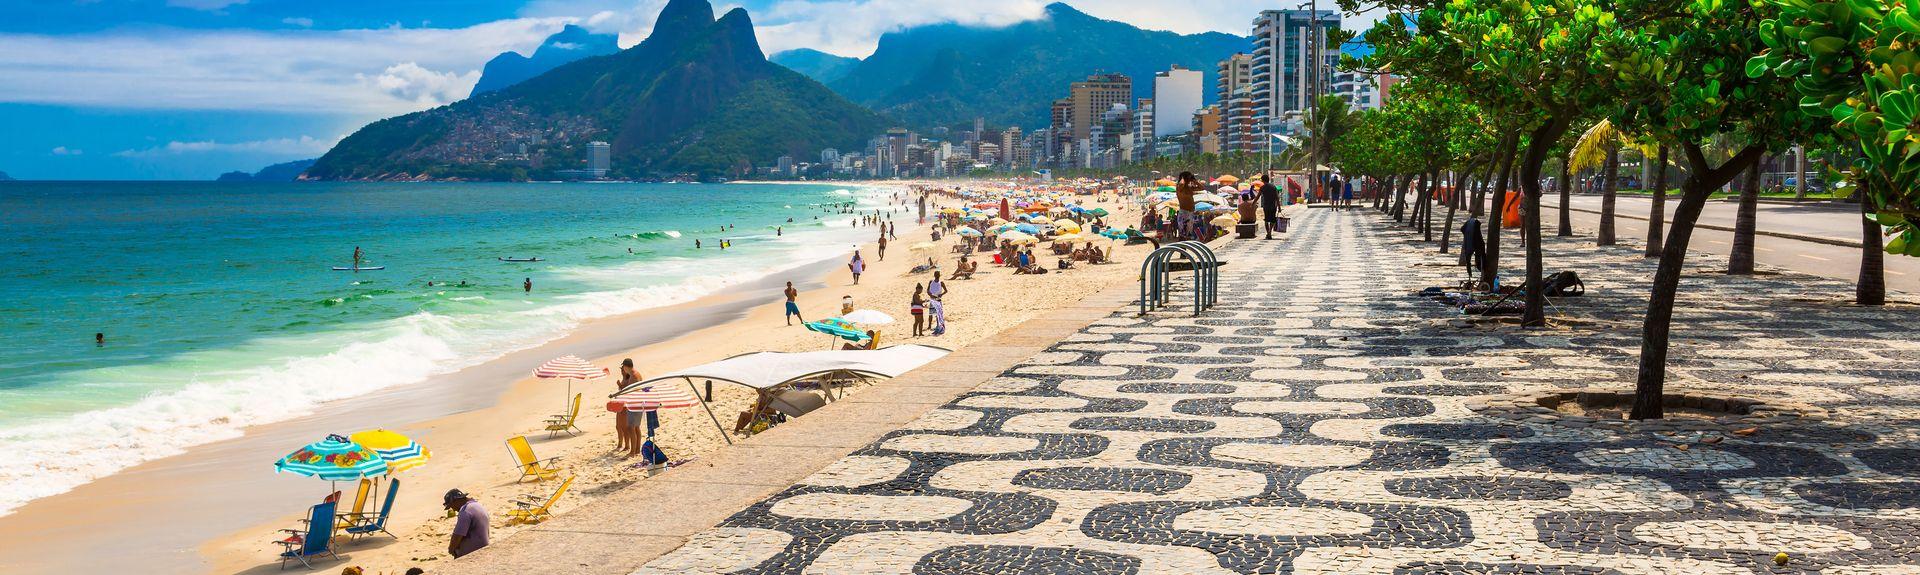 Ipanema - Leblon, Rio de Janeiro, Kaakkoisalue, Brasilia